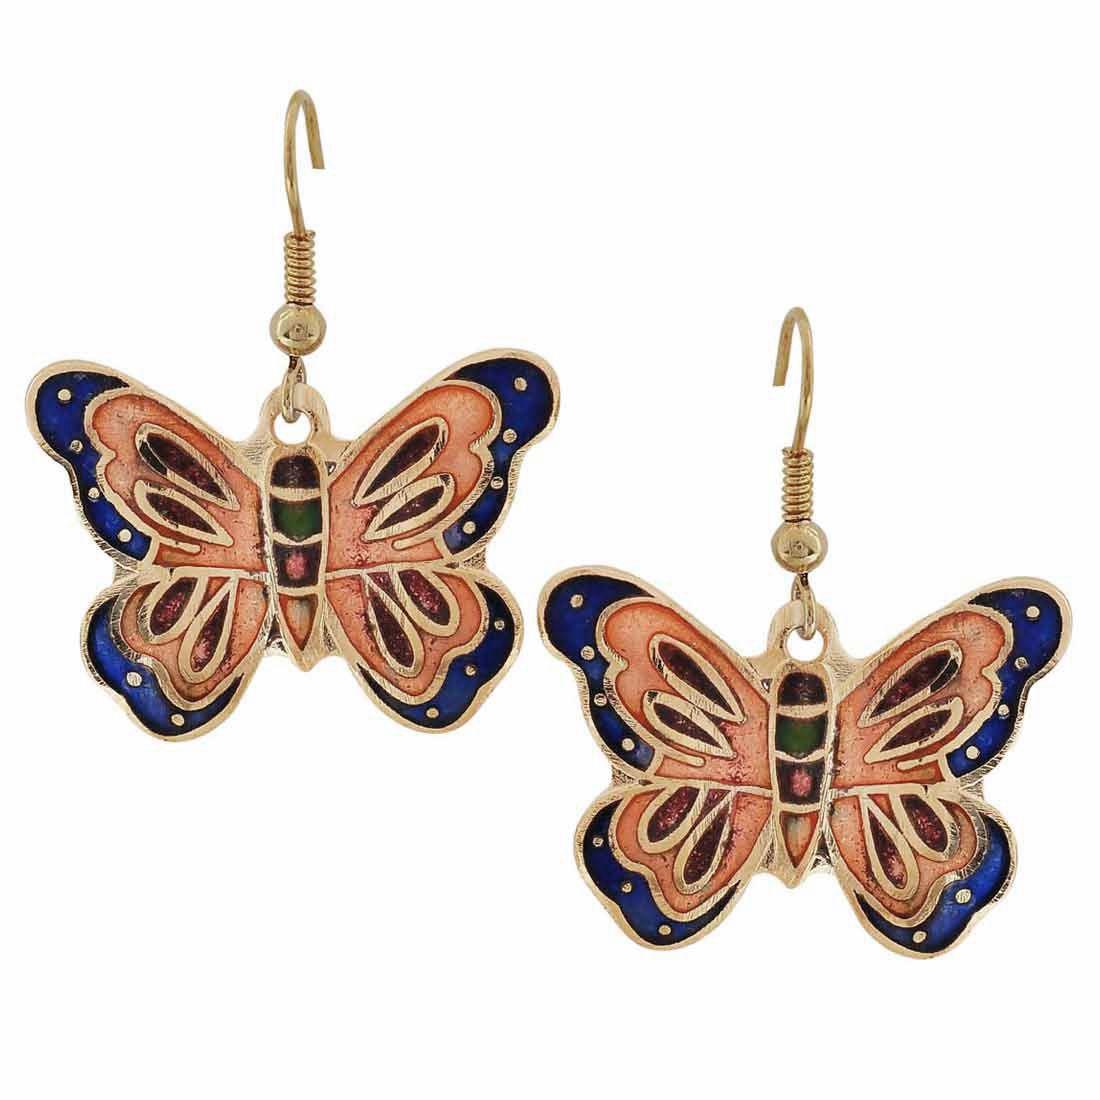 Maayra Party Earrings Alloy Dangler Drop Multicolour Meenakari Butterfly Jewellery